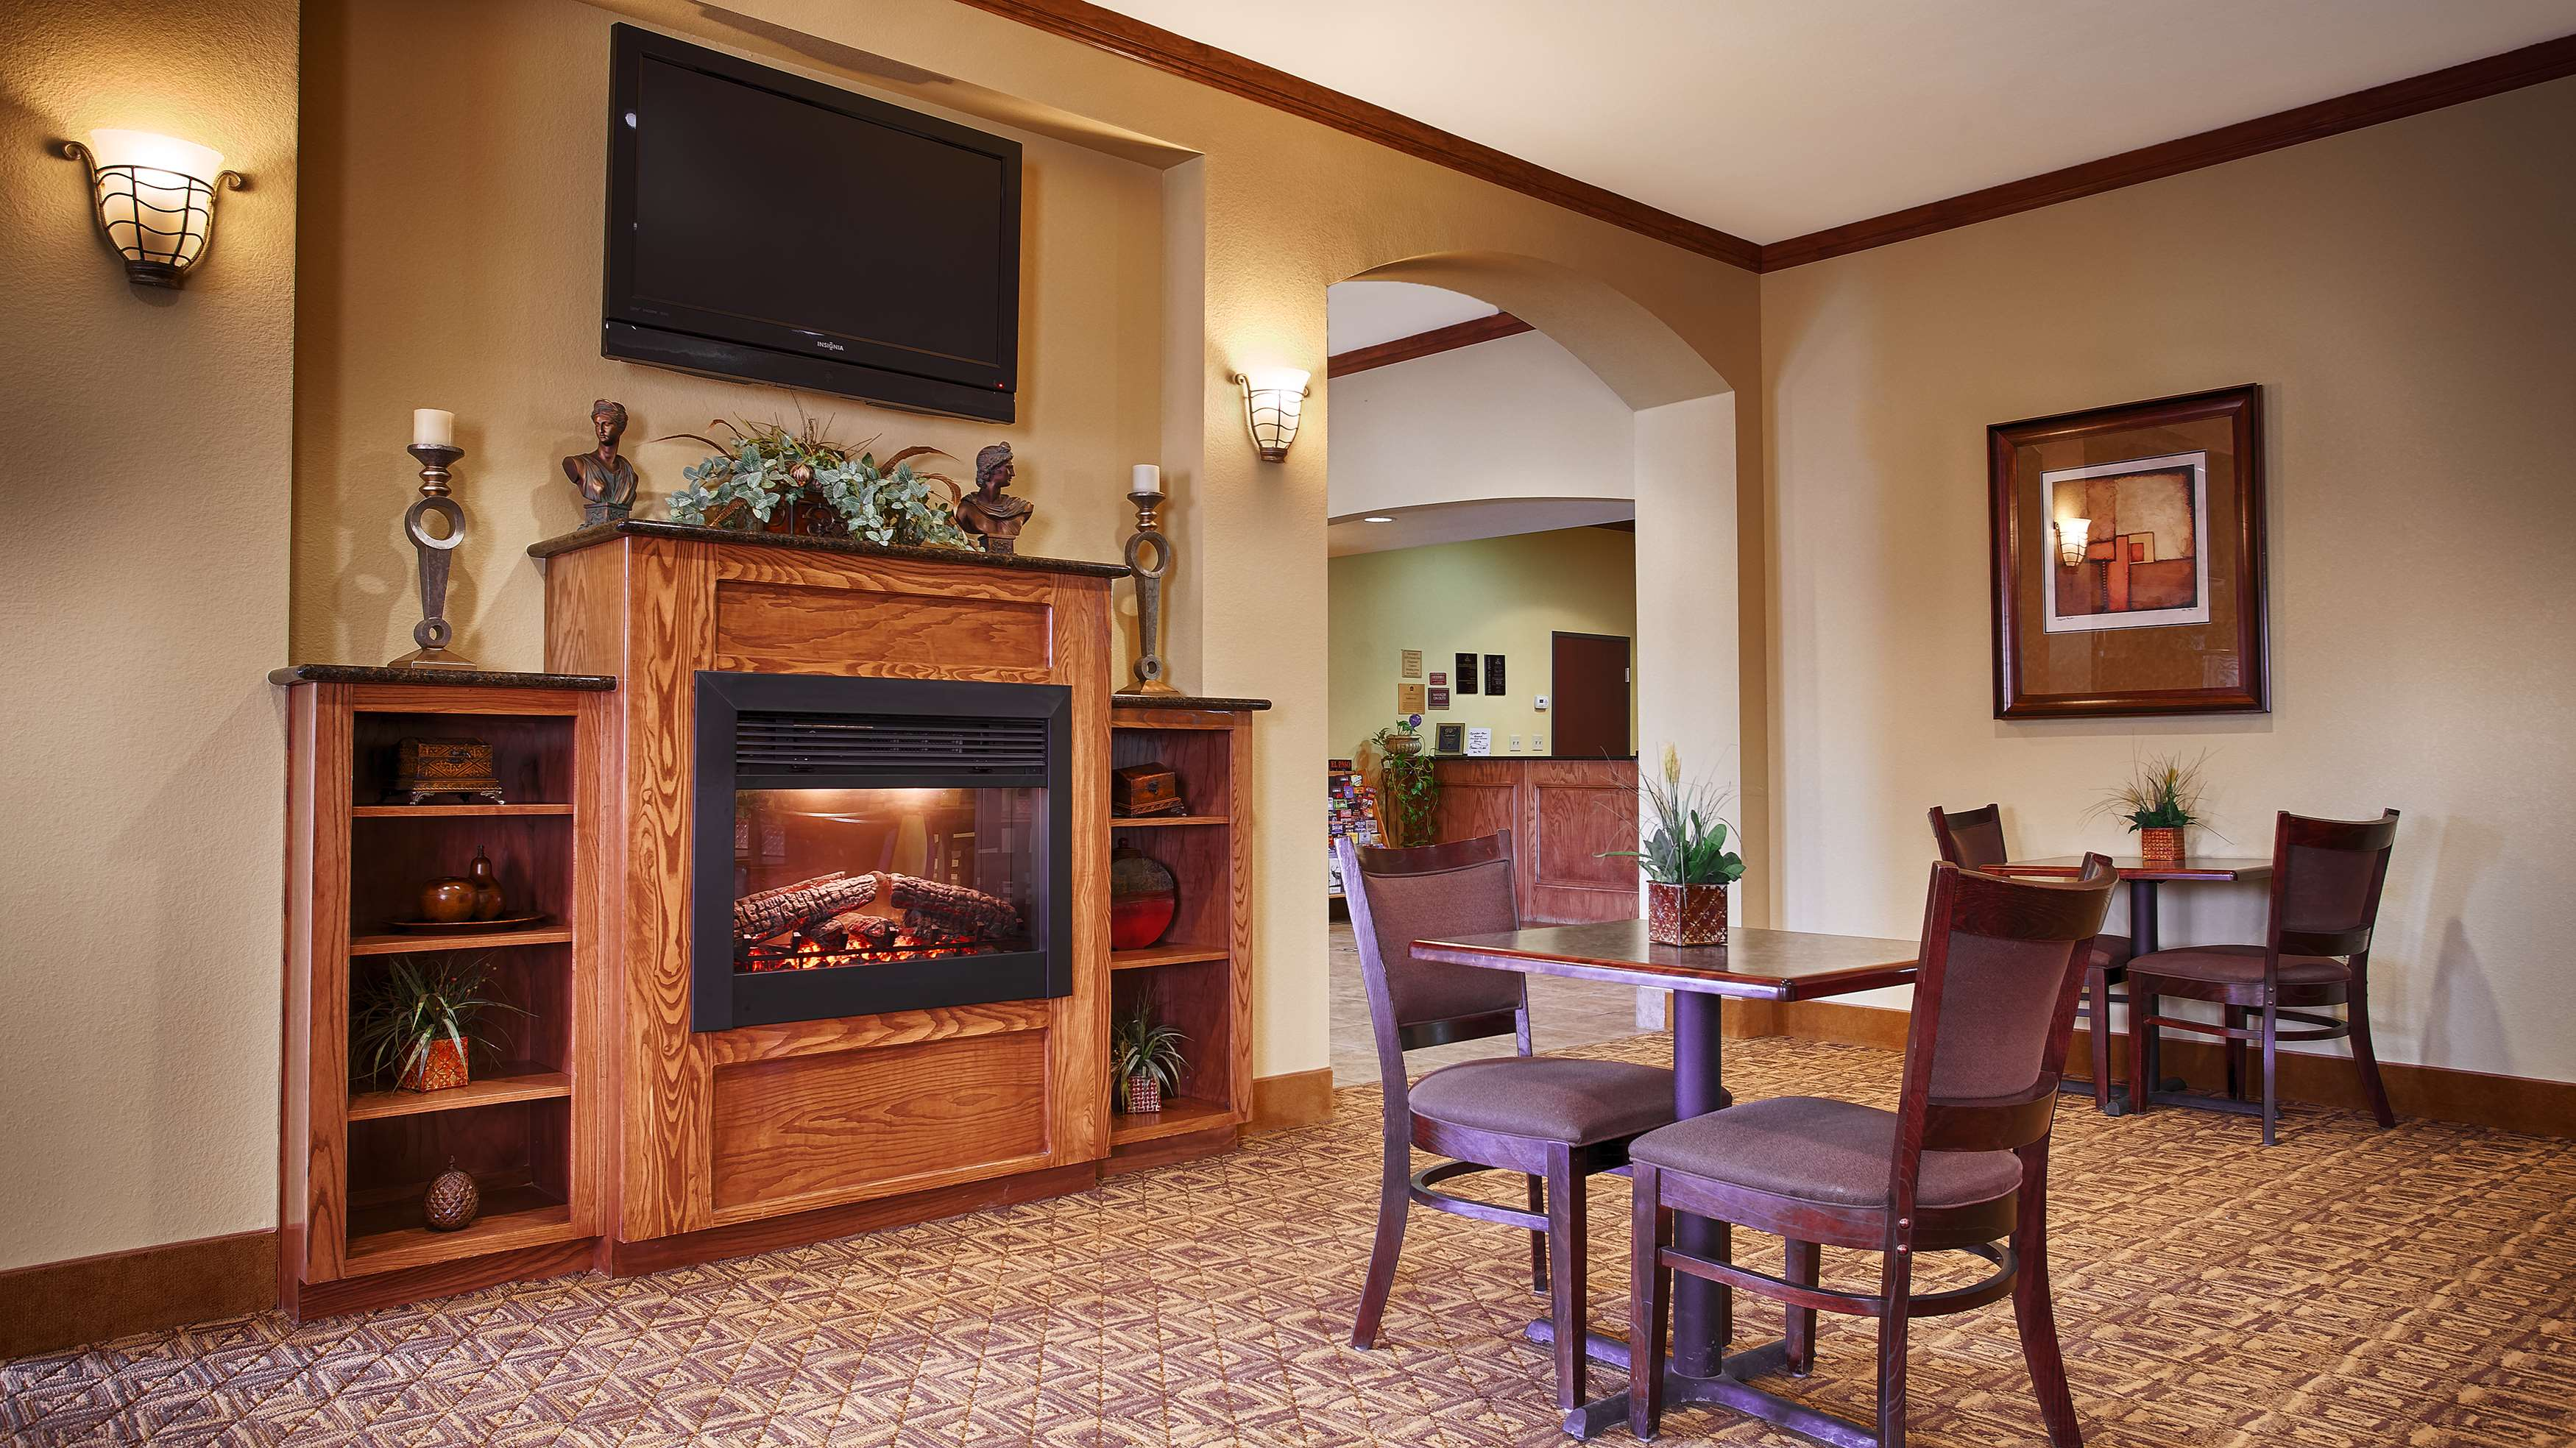 Best Western Littlefield Inn & Suites image 15